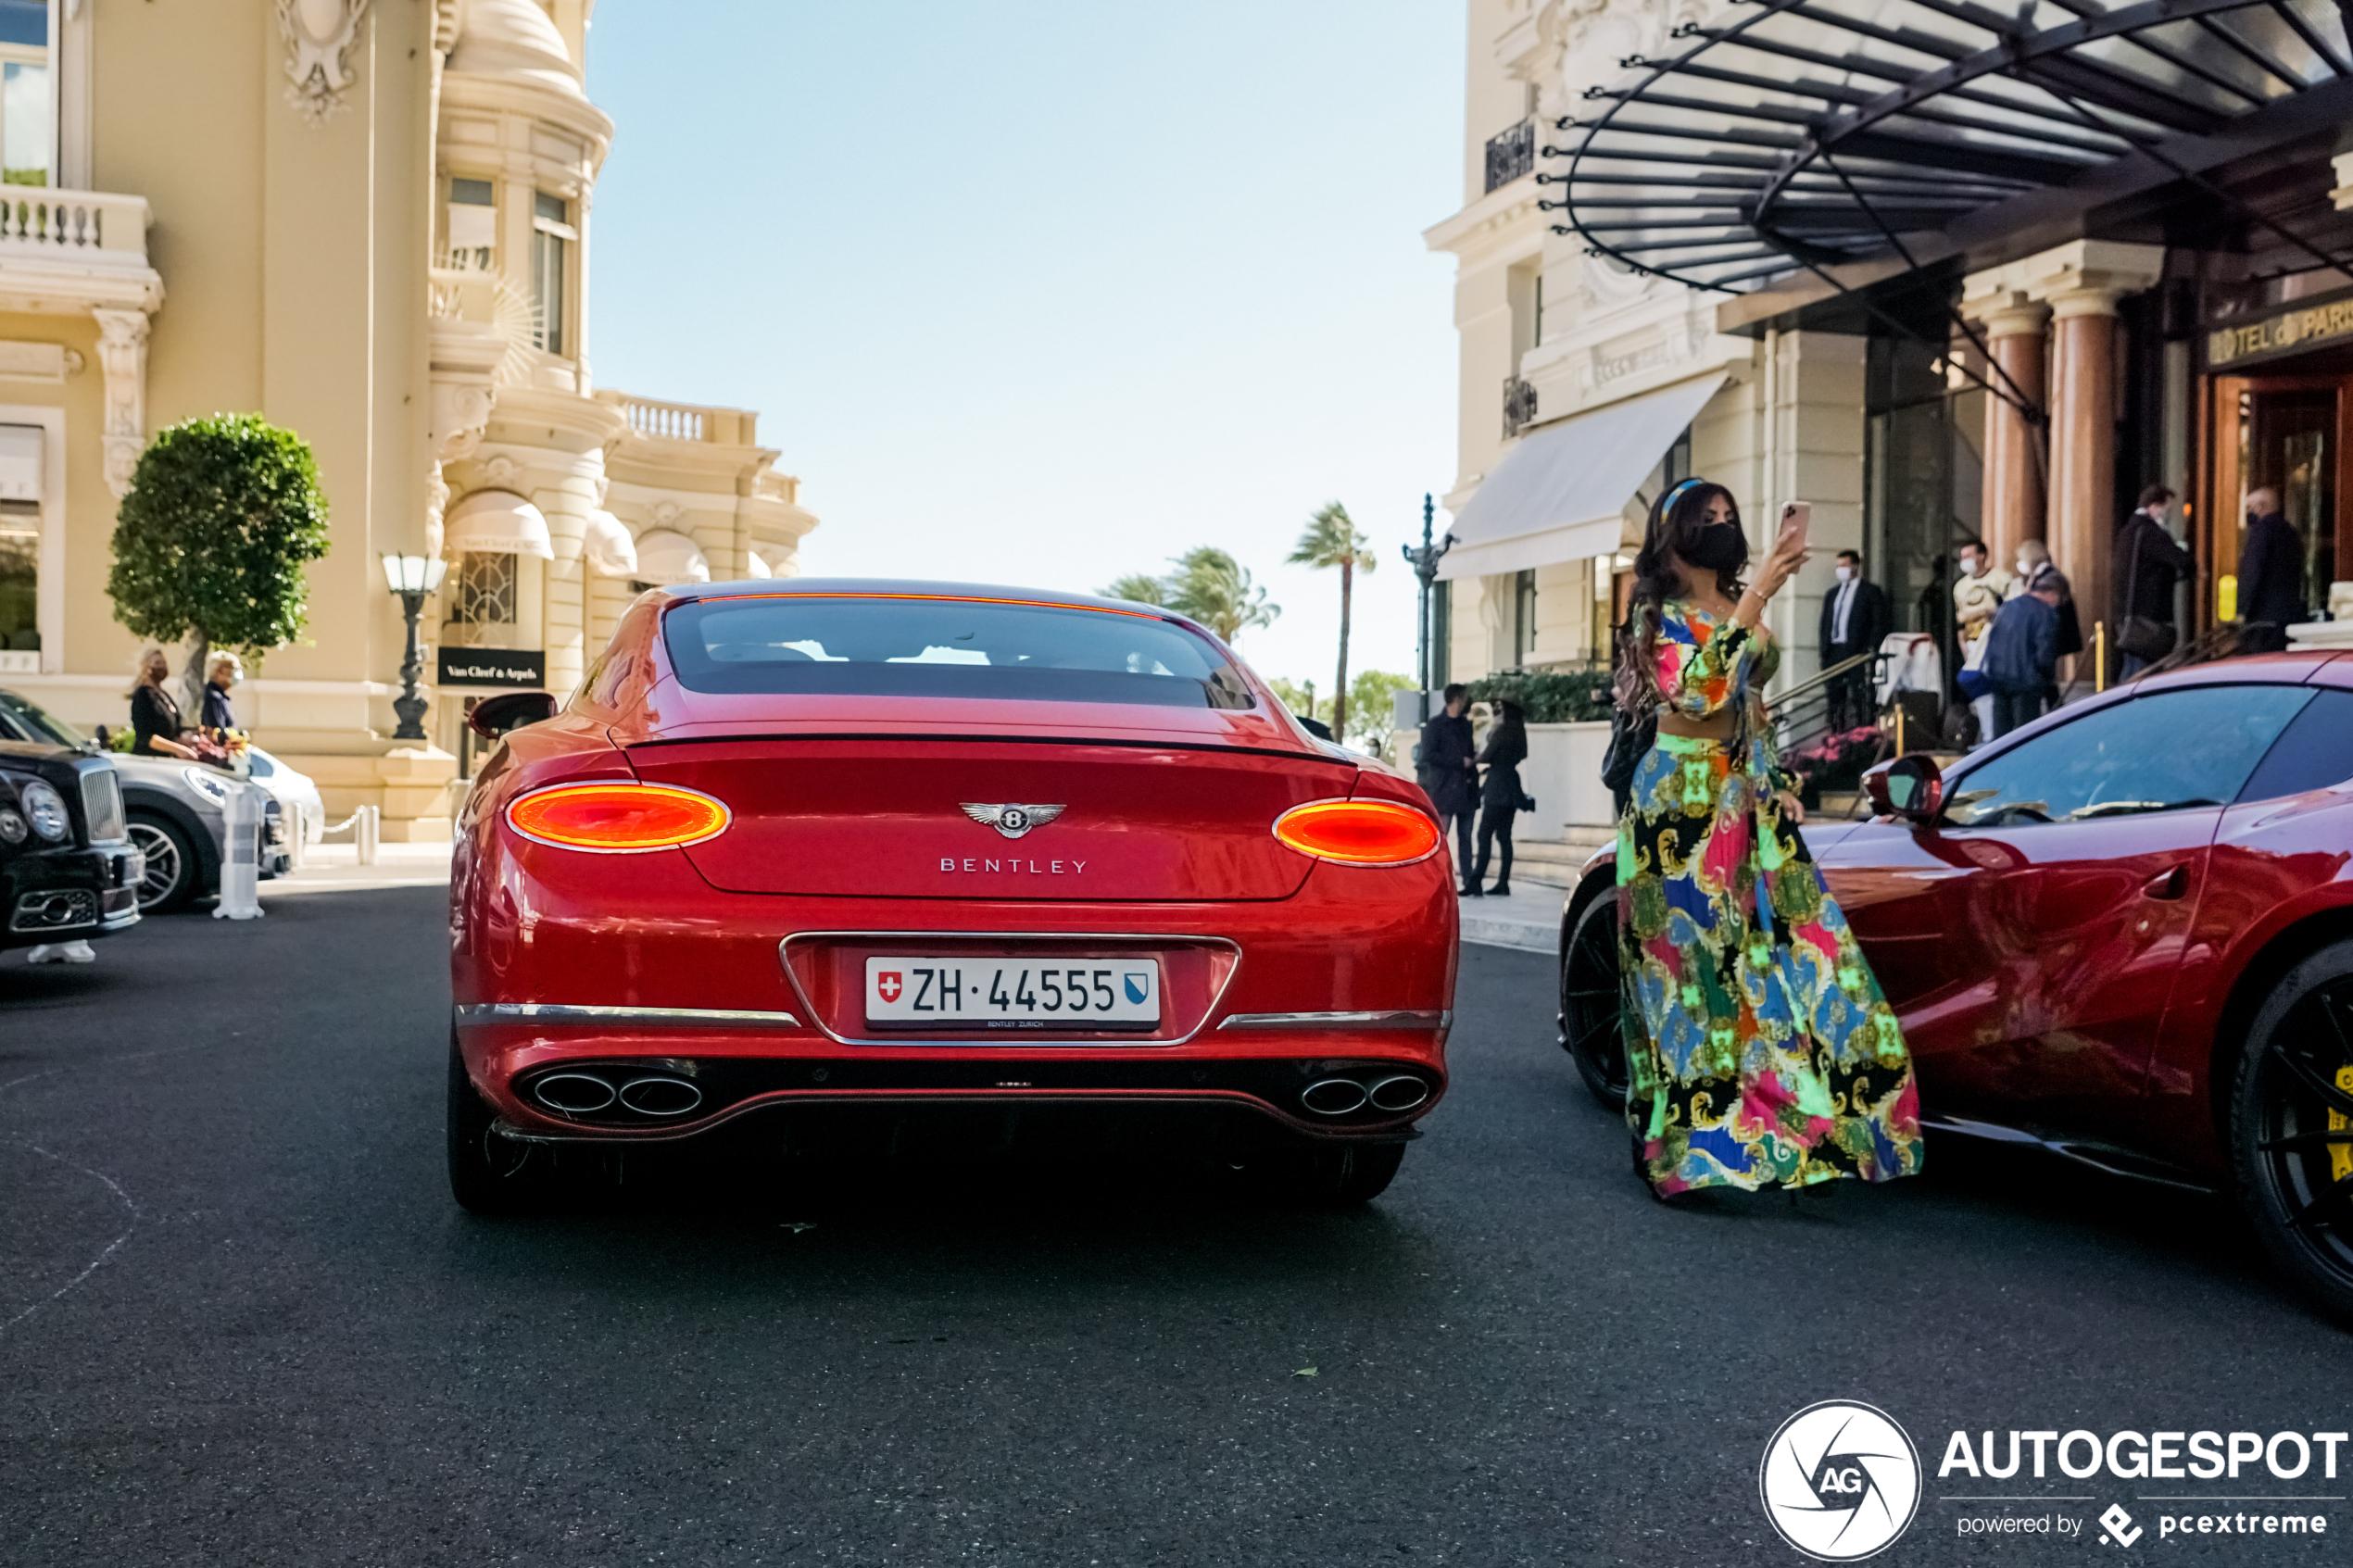 Monaco nog altijd vol glamour ondanks COVID-19